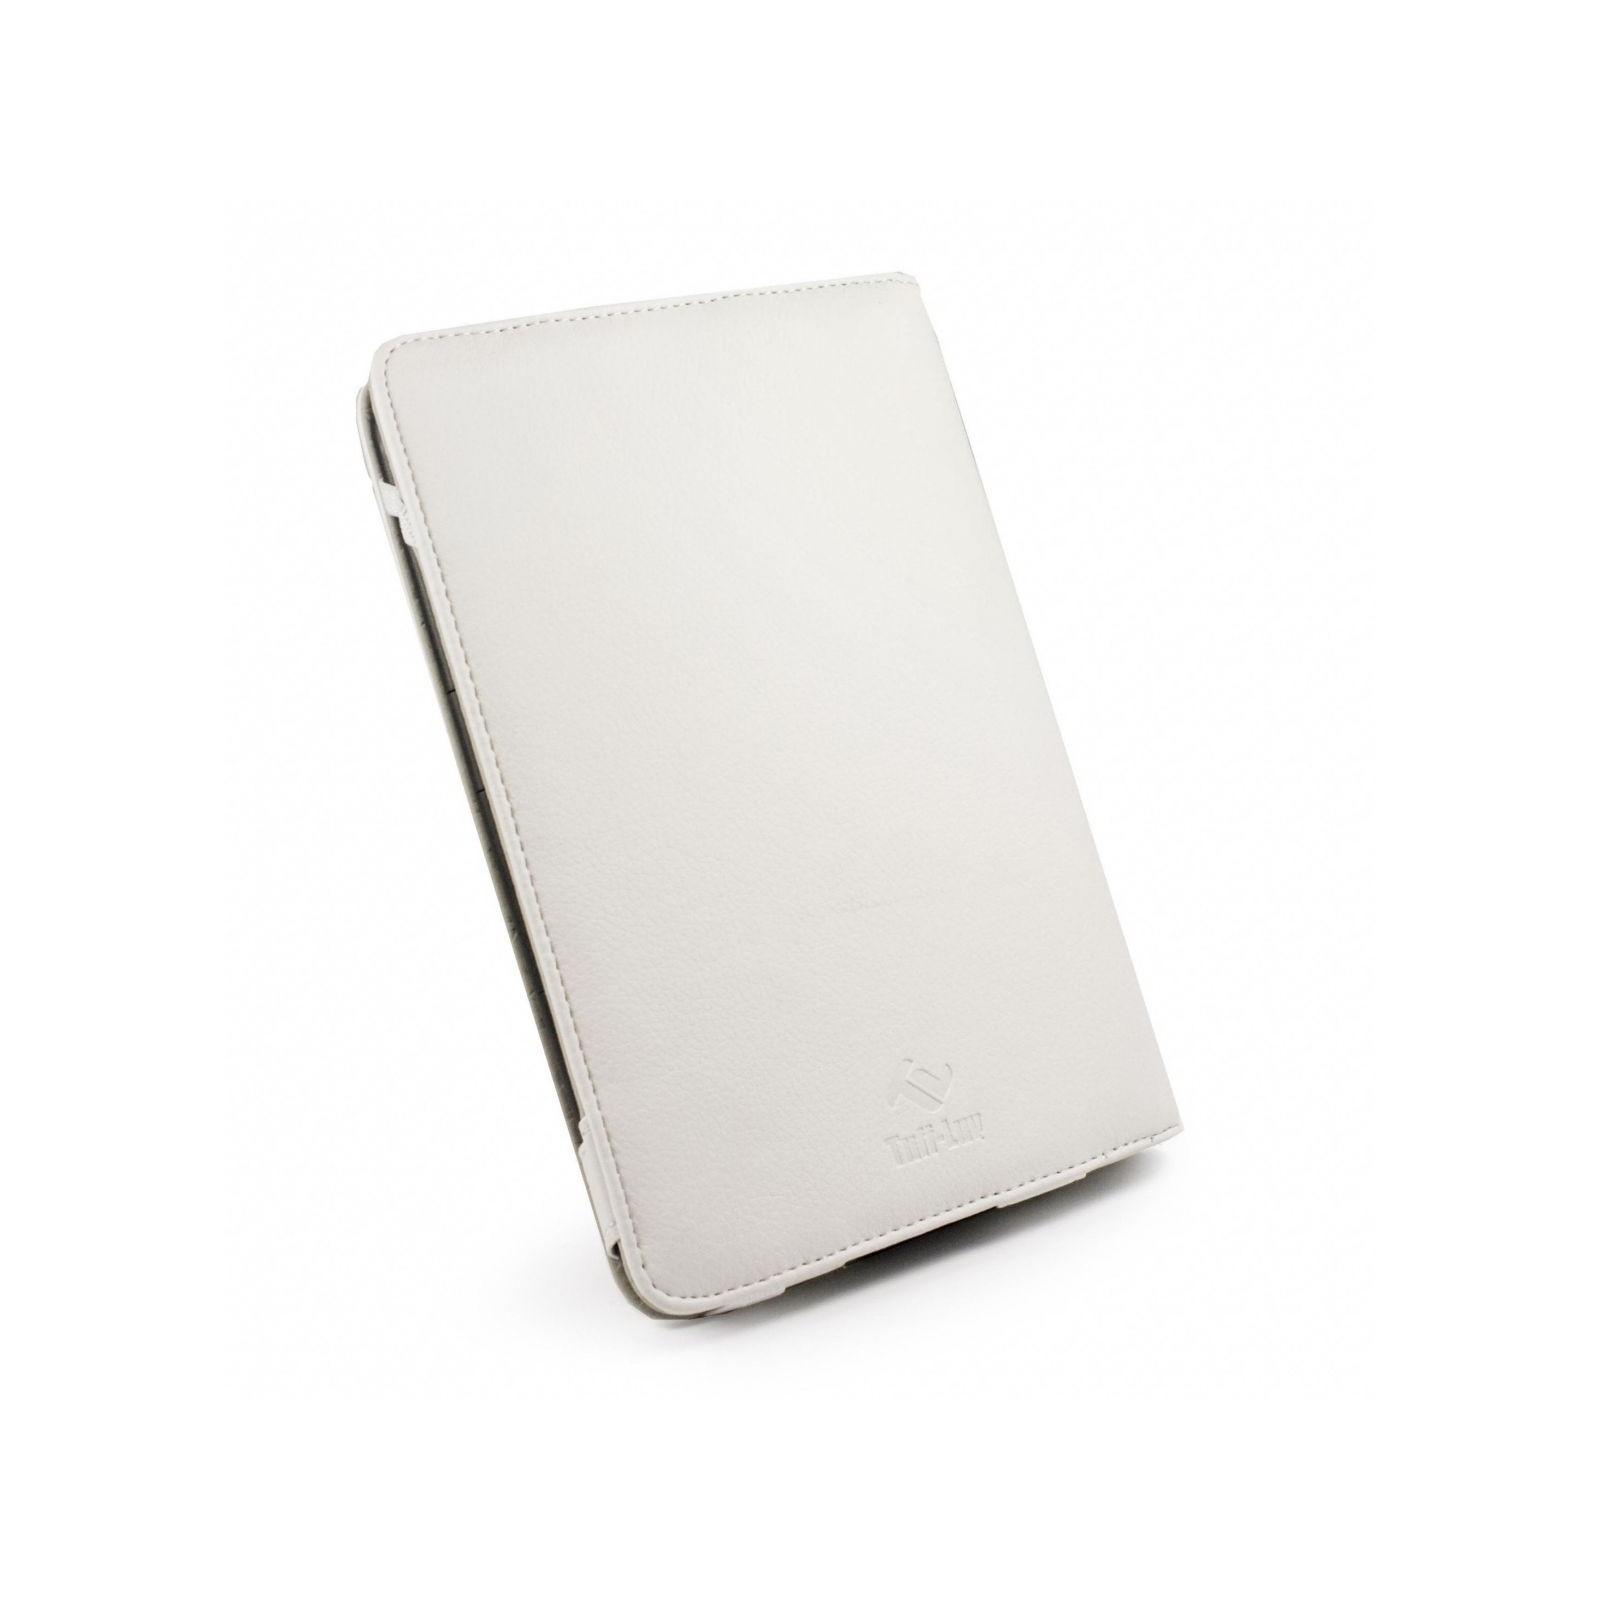 Чехол для электронной книги Tuff-Luv 6 Embrace faux leather/Arctic White (C4_56)